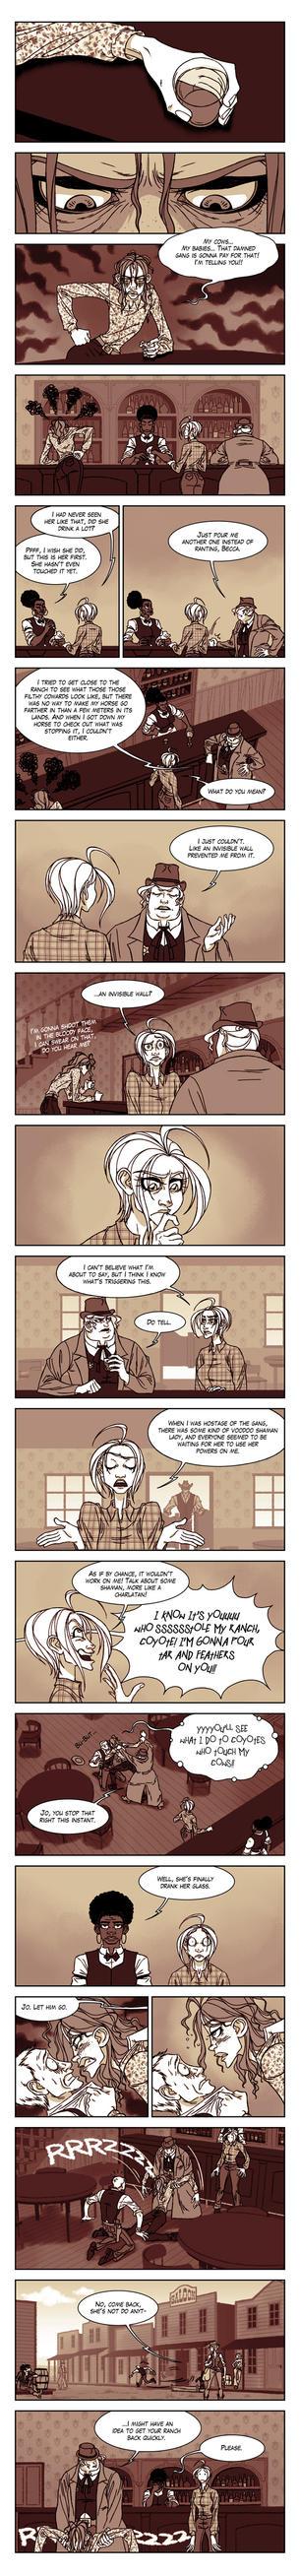 Jo strip 30 by JackPot-84